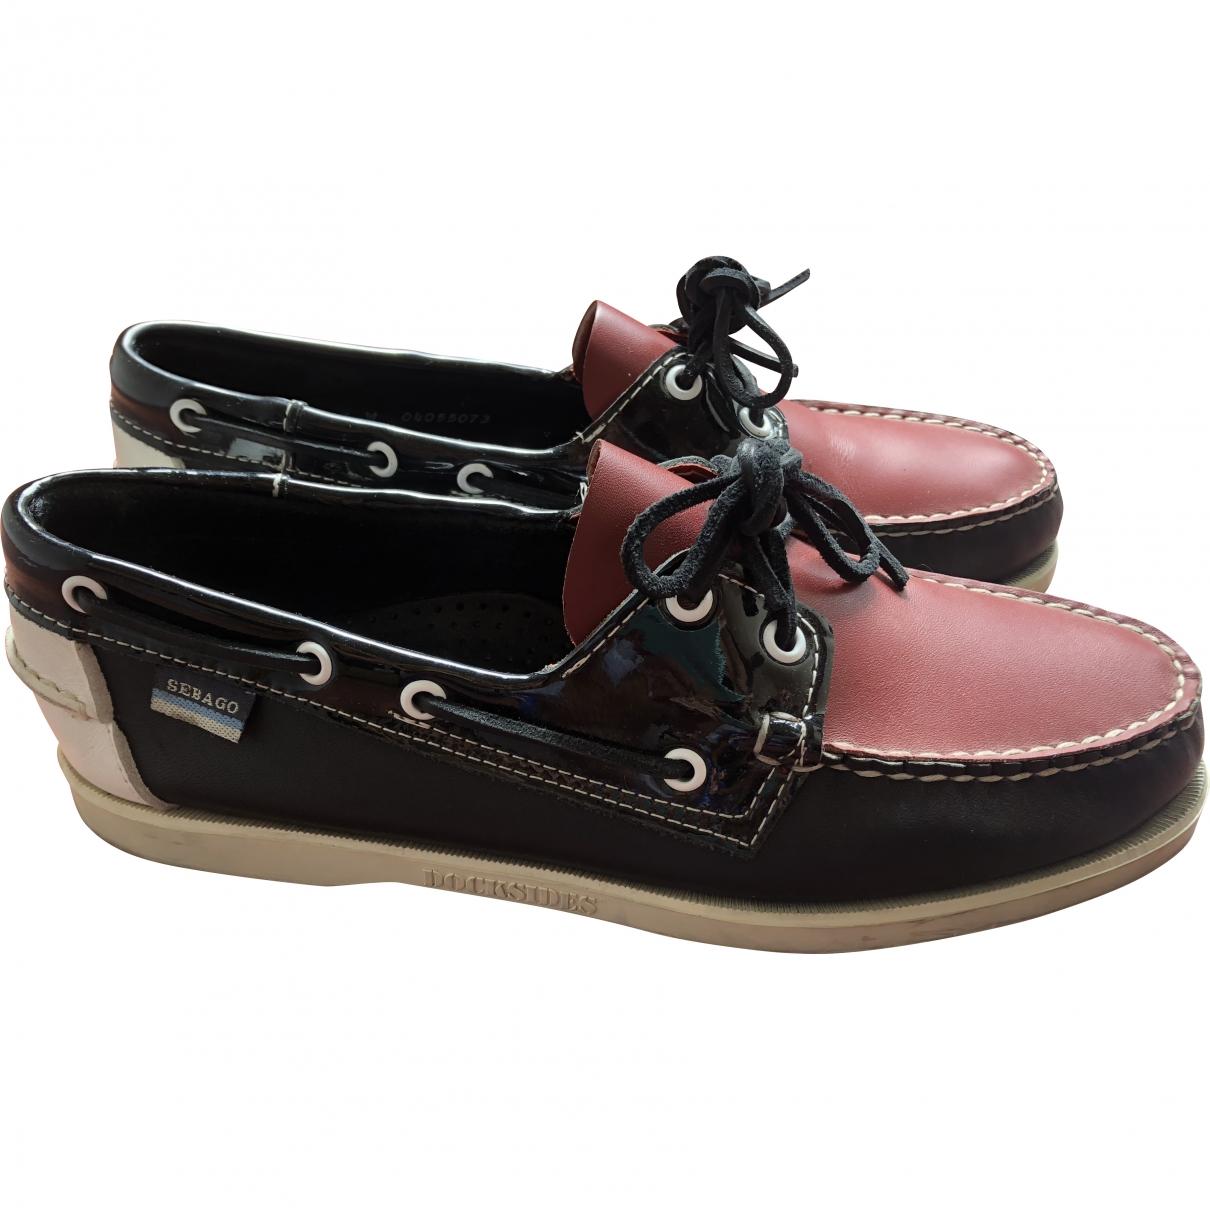 Sebago \N Multicolour Leather Flats for Men 43 EU